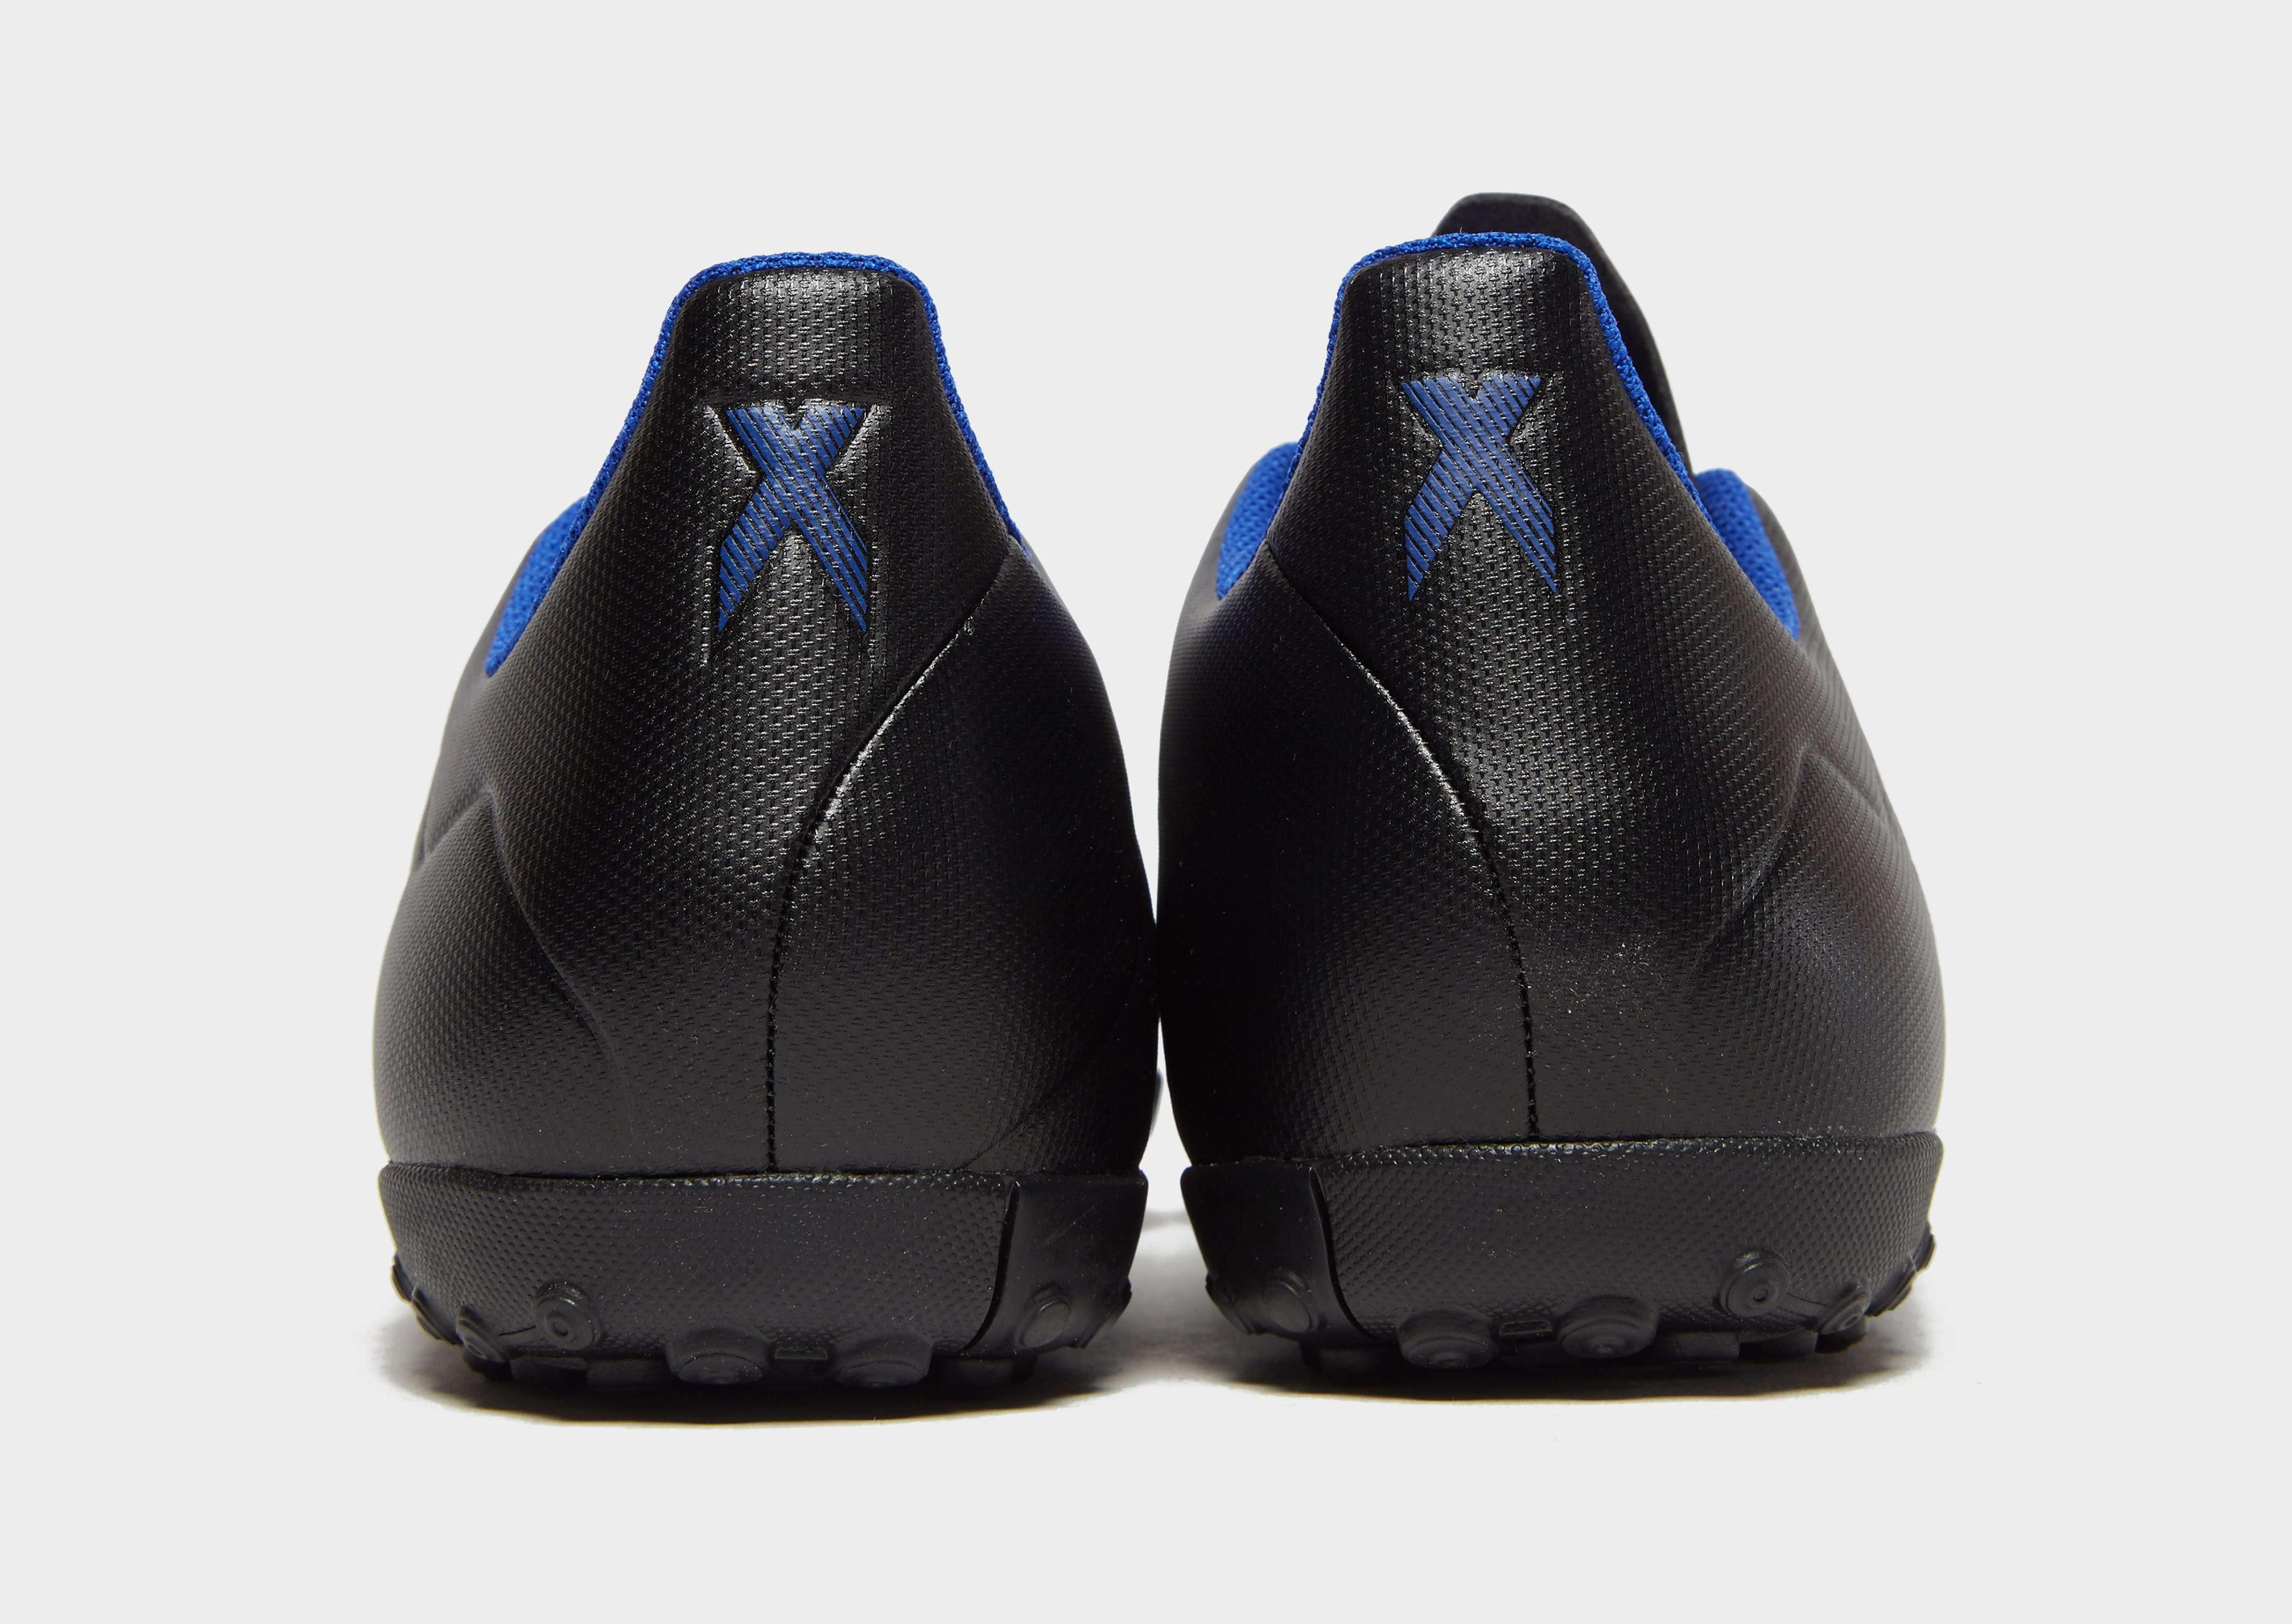 adidas Archetic X 18.4 TF